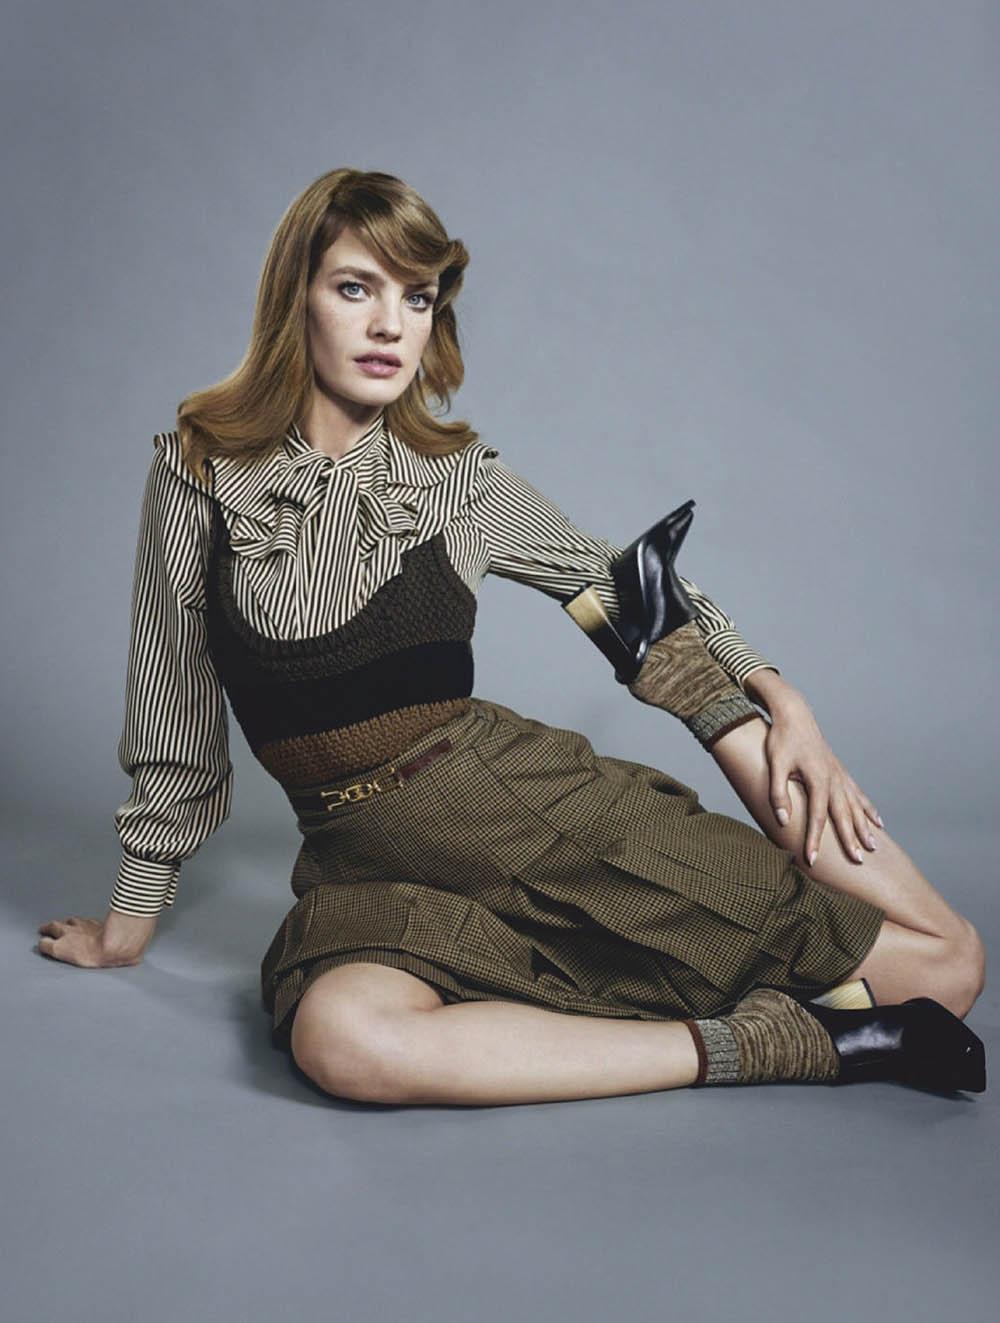 Natalia Vodianova covers Elle Russia February 2020 by Mathieu Cesar